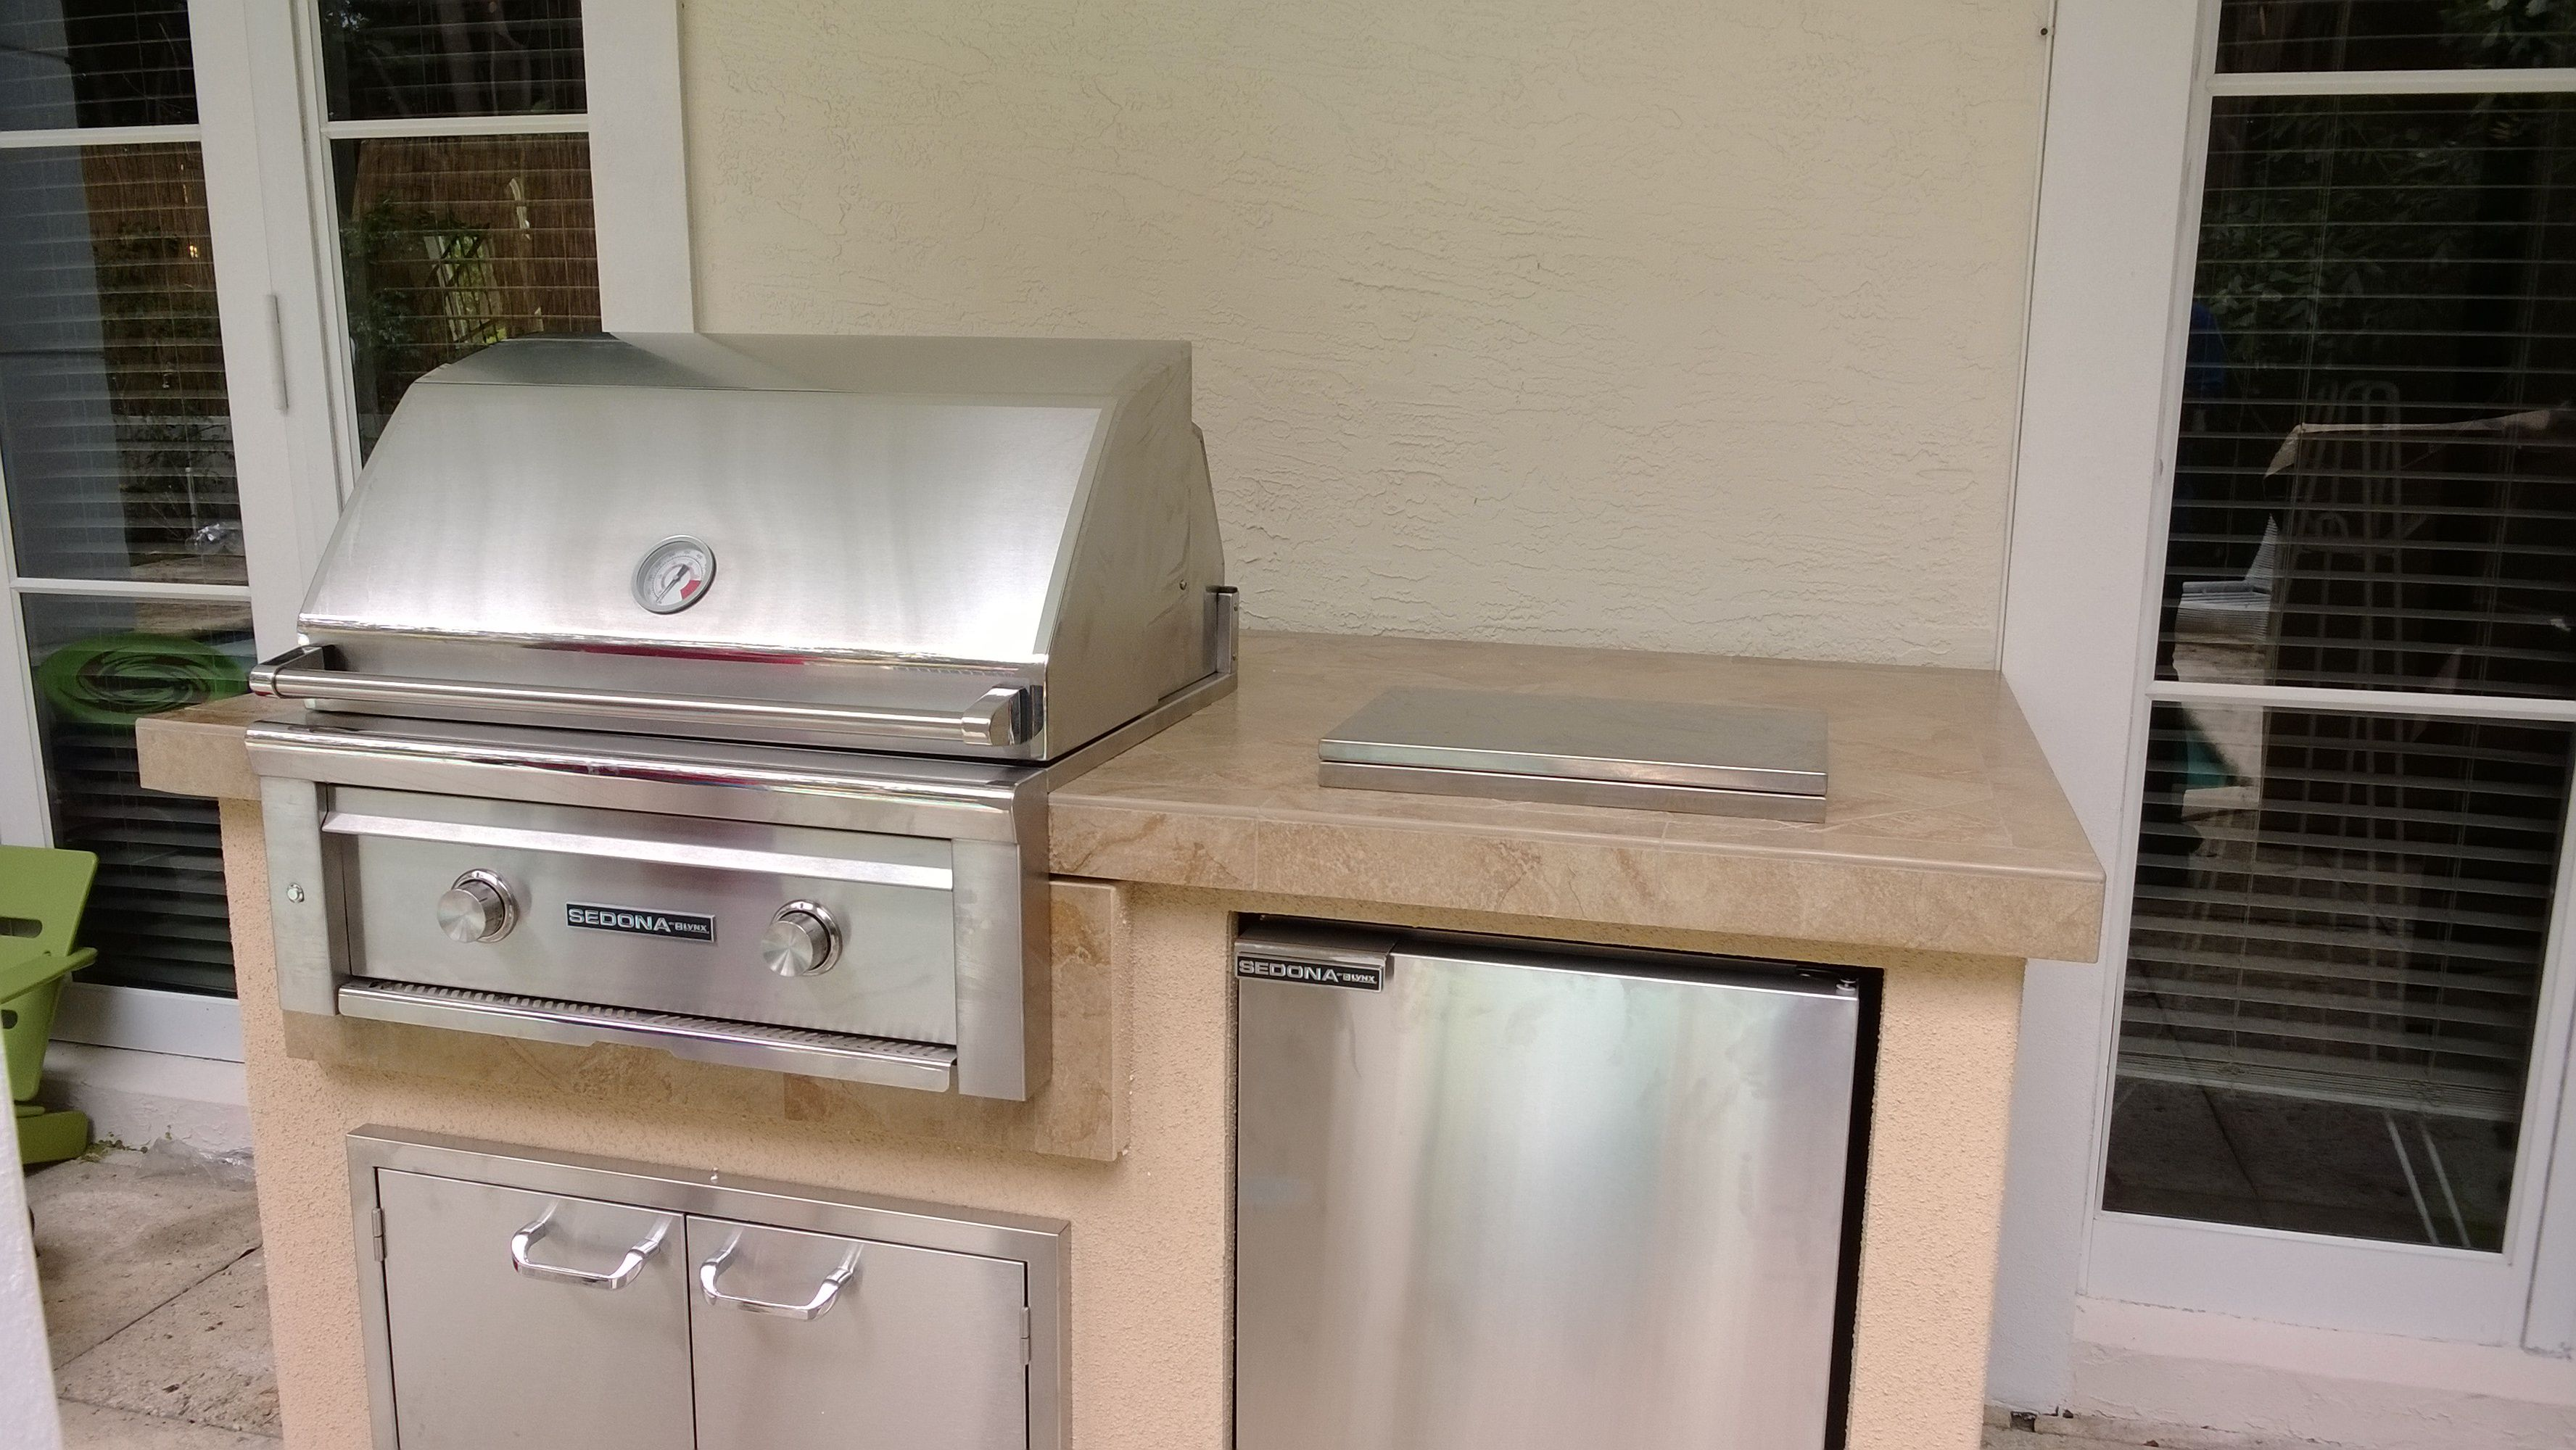 Lynx Sedona Barbecue Grill Island Installed In Miami Beach Grill Island Double Wall Oven Barbecue Grill